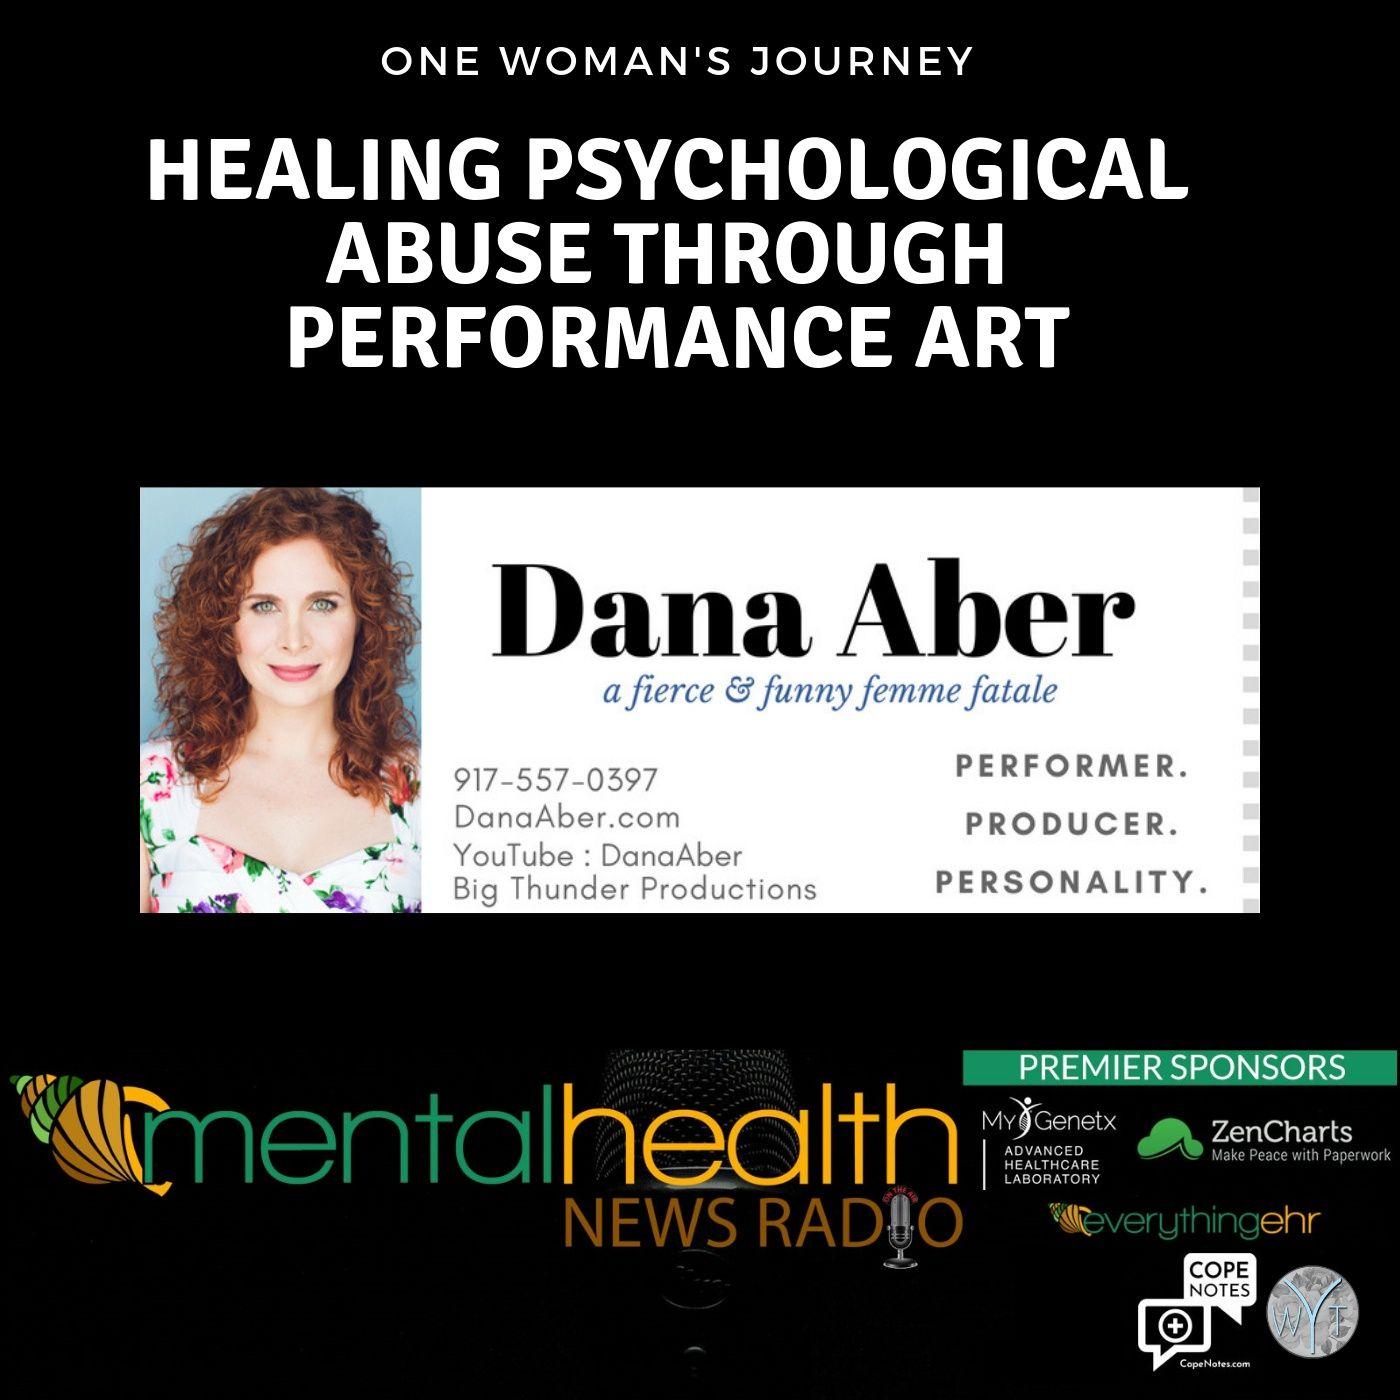 Mental Health News Radio - One Woman's Journey: Healing Psychological Abuse Through Performance Art